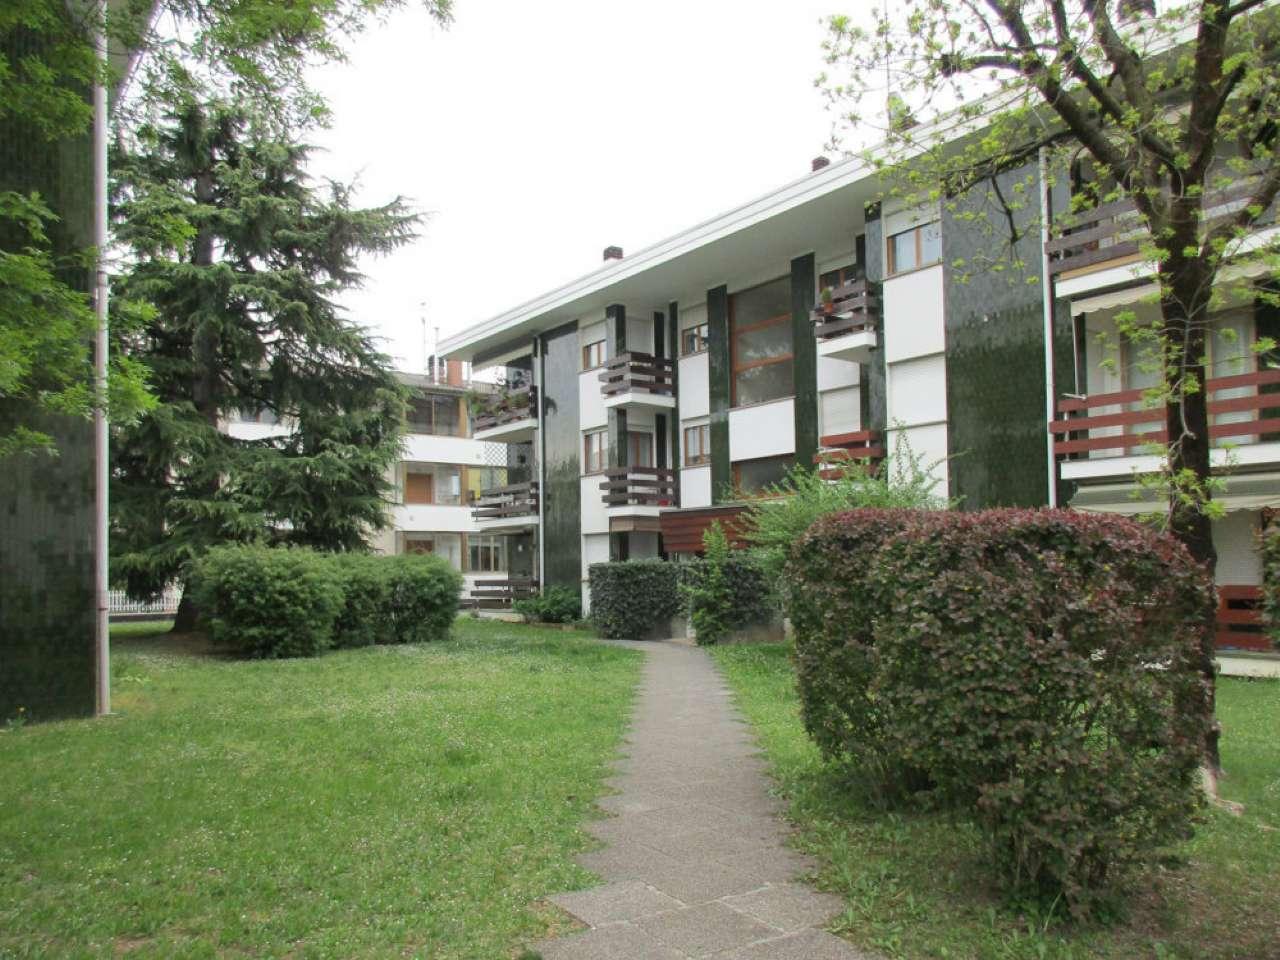 Appartamento 6 locali in vendita a Udine (UD)